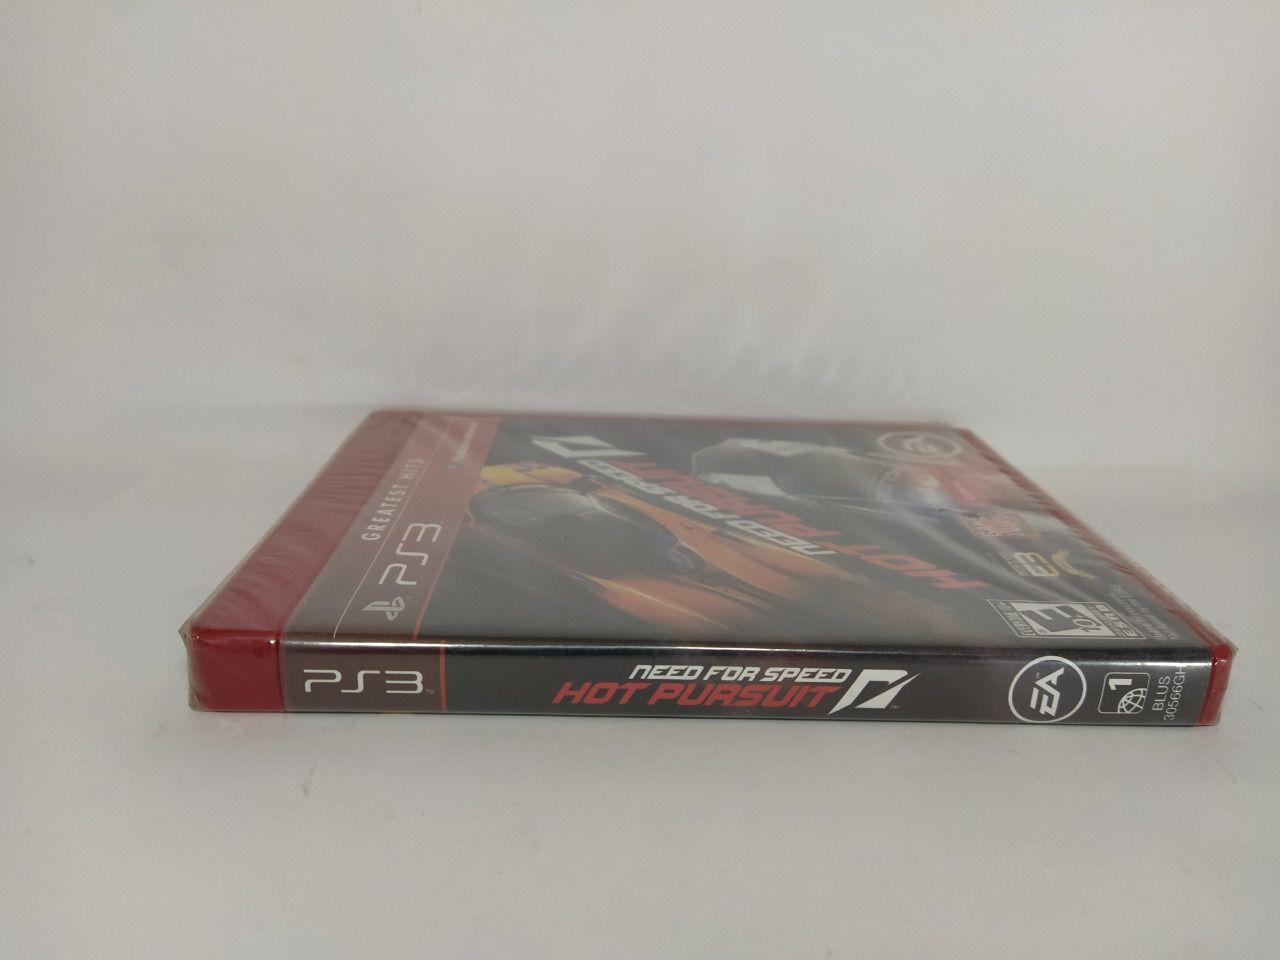 Jogo Ps3 Need for Speed: Hot Pursuit Mídia Física Lacrado